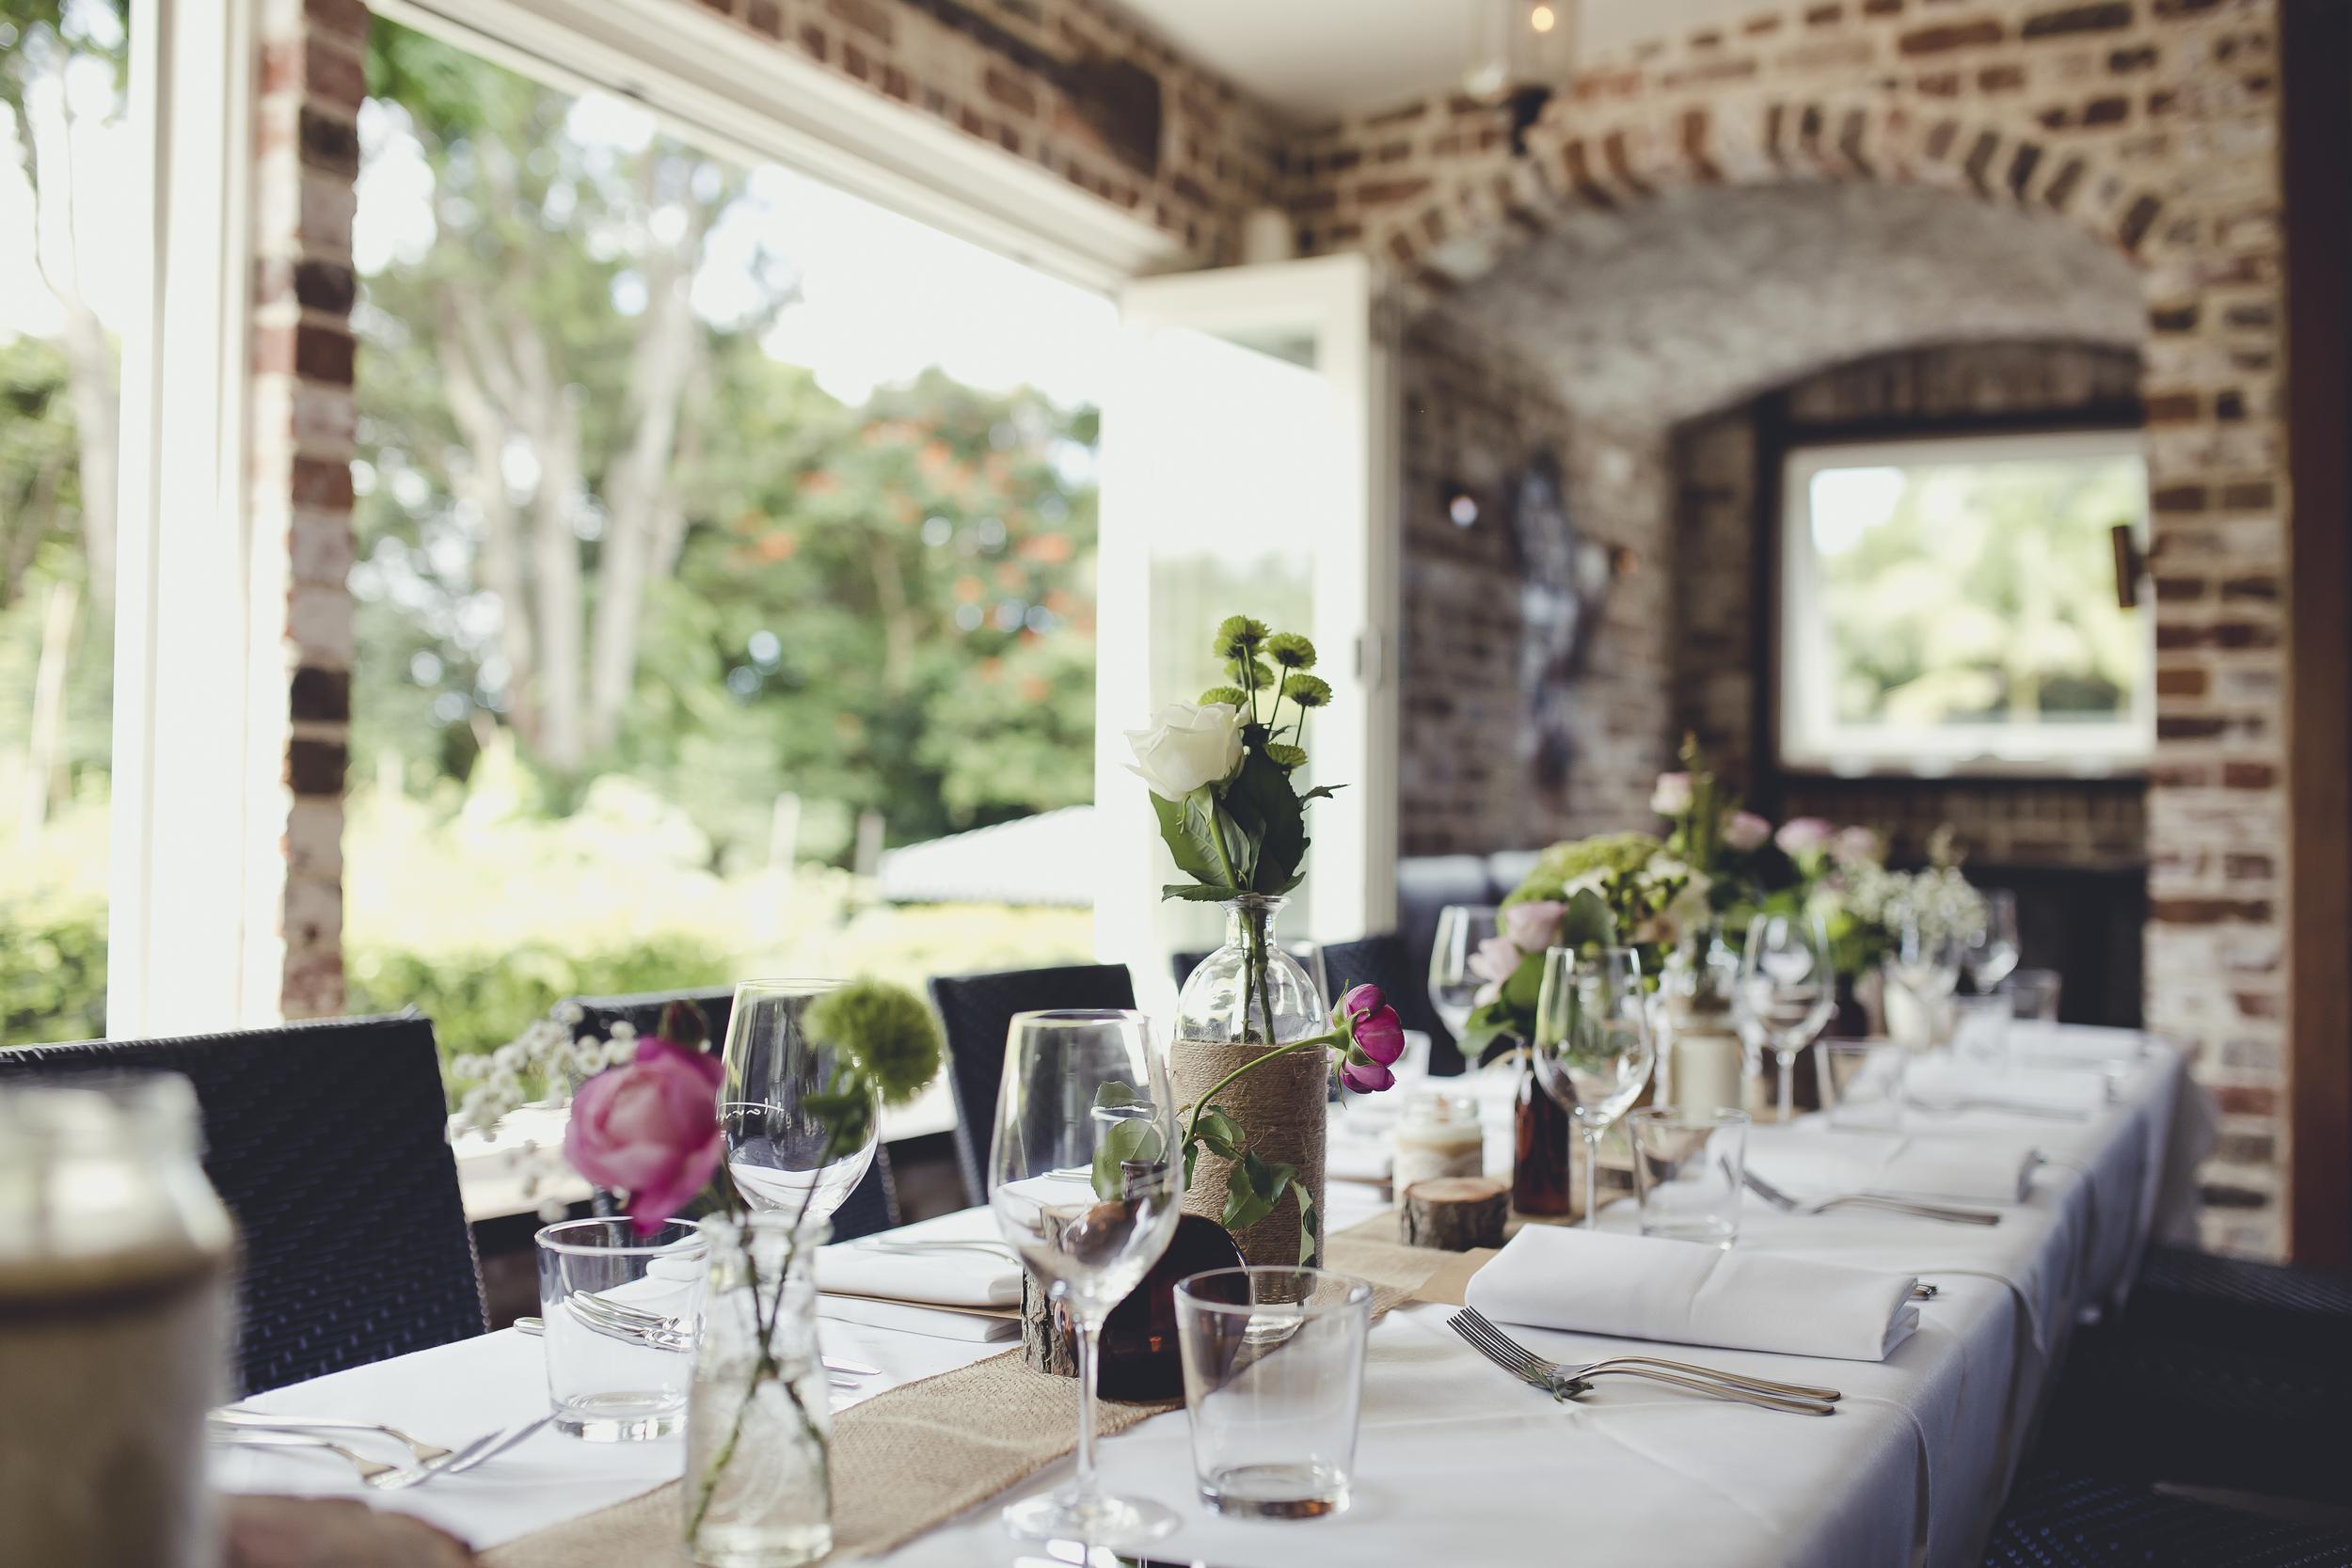 Byron Bay Wedding Harvest Cafe - Carly Tia Photography 001.jpg